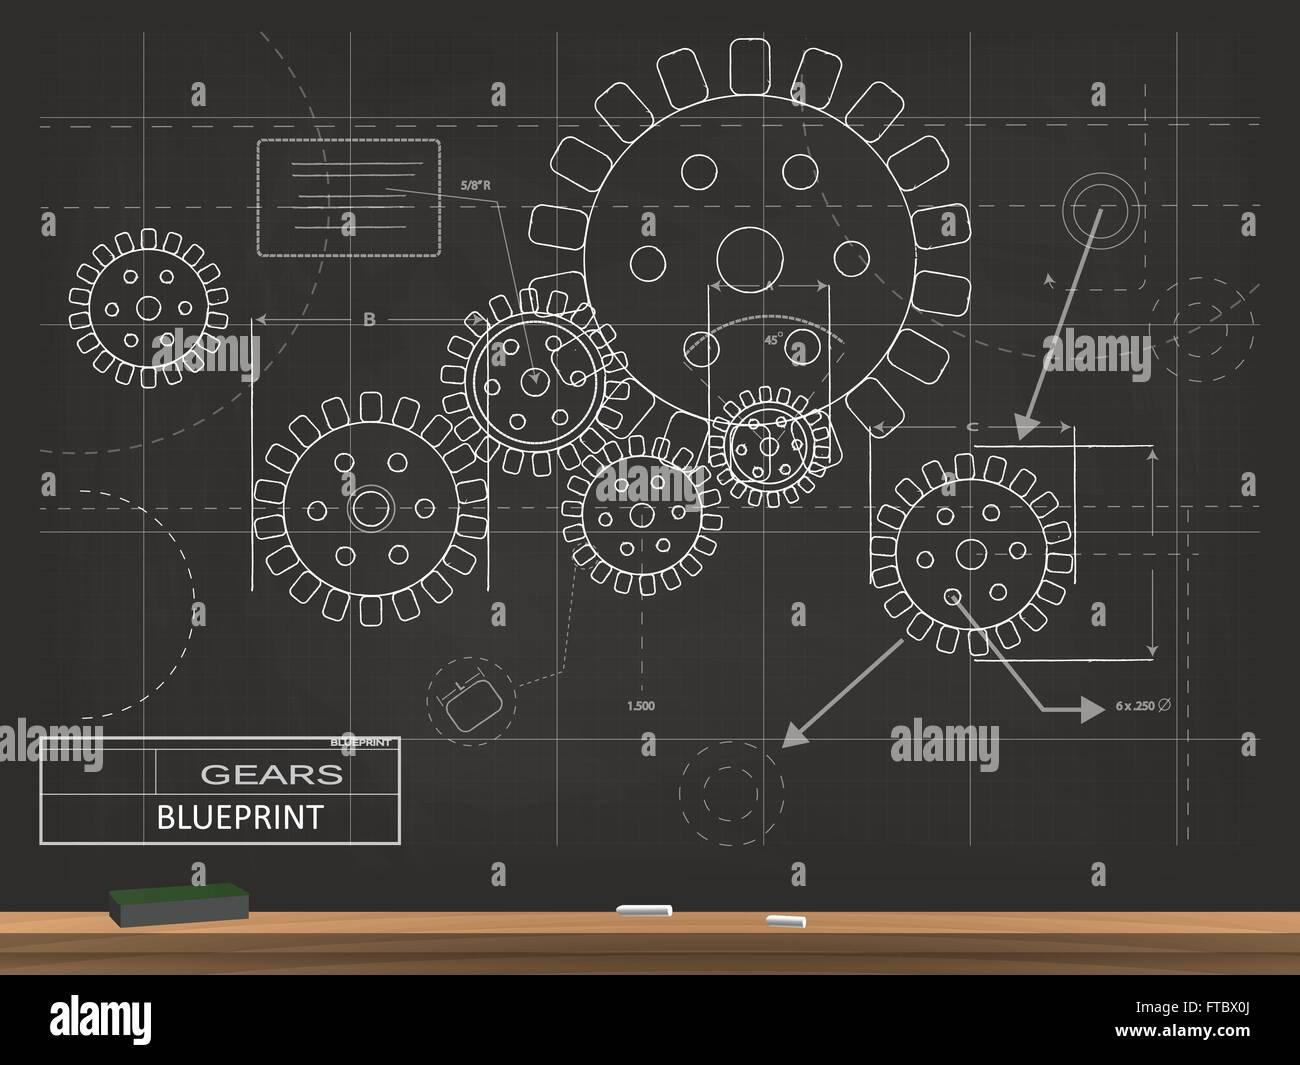 Gears blueprint chalkboard vector illustration stock vector art gears blueprint chalkboard vector illustration malvernweather Image collections